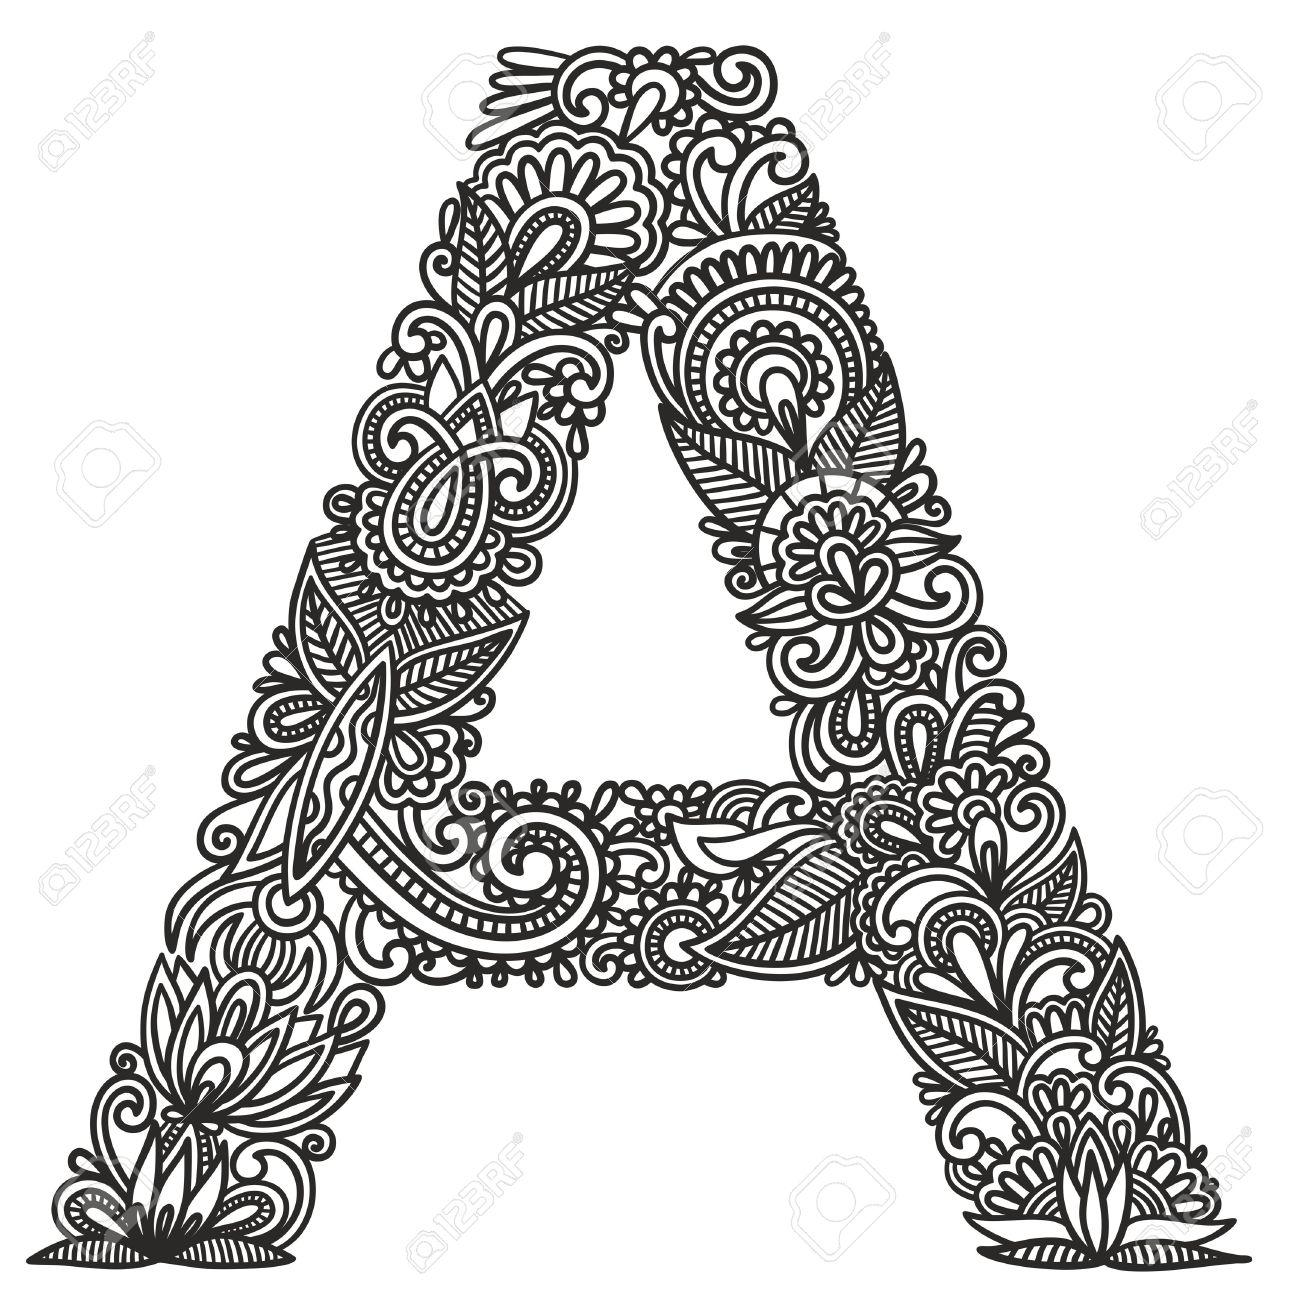 1290x1300 Hand Drawing Ornamental Alphabet Royalty Free Cliparts, Vectors